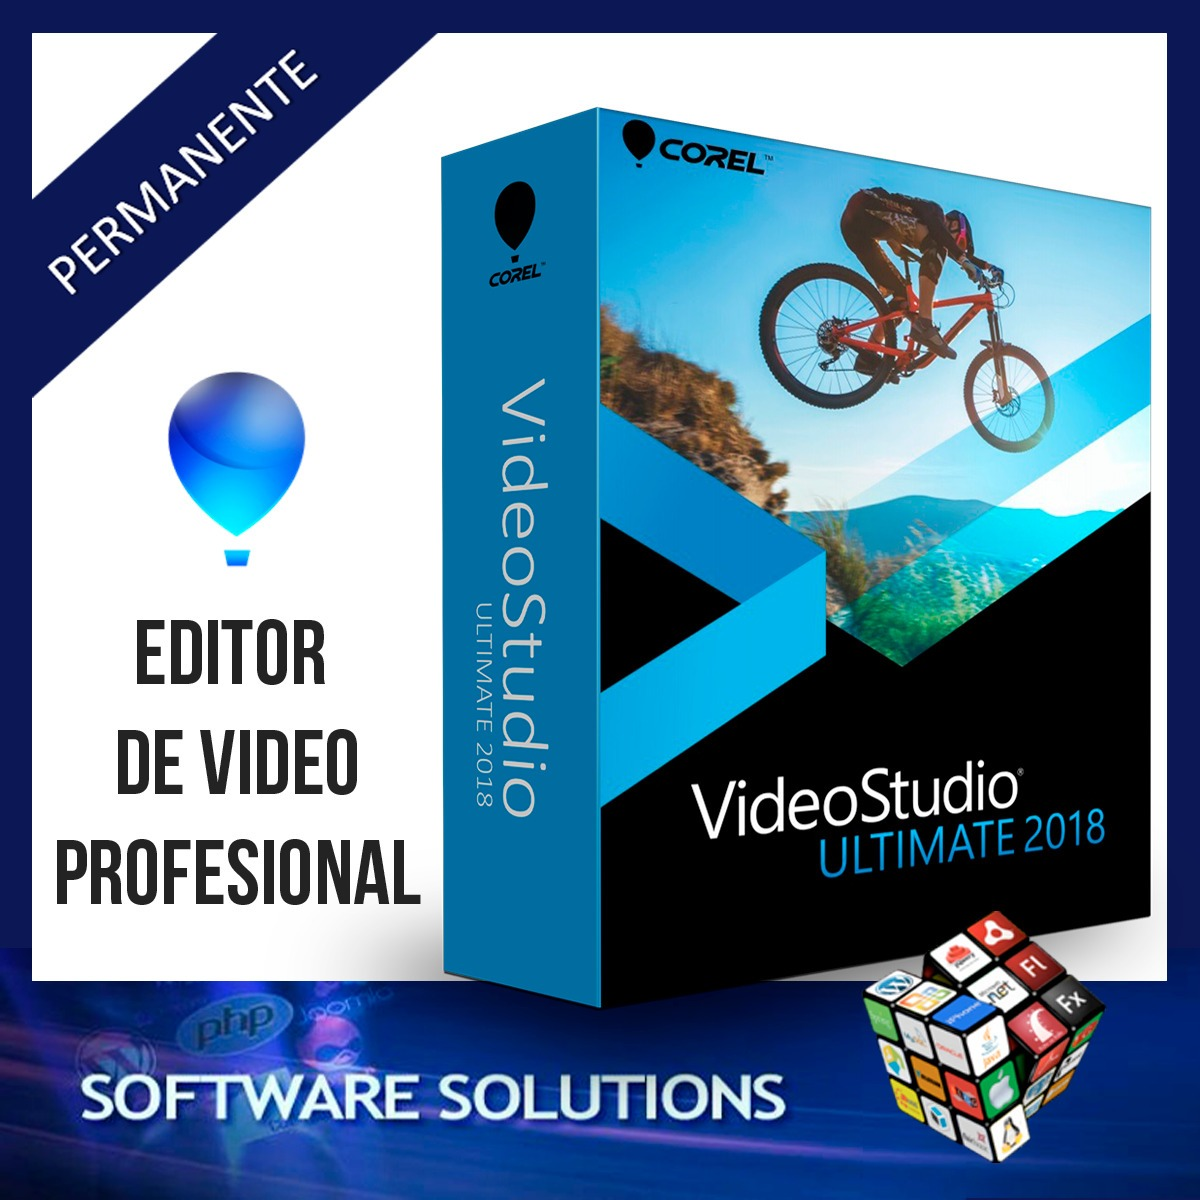 Corel Videostudio Ultimate 2018 Editor De Vídeo Profesional